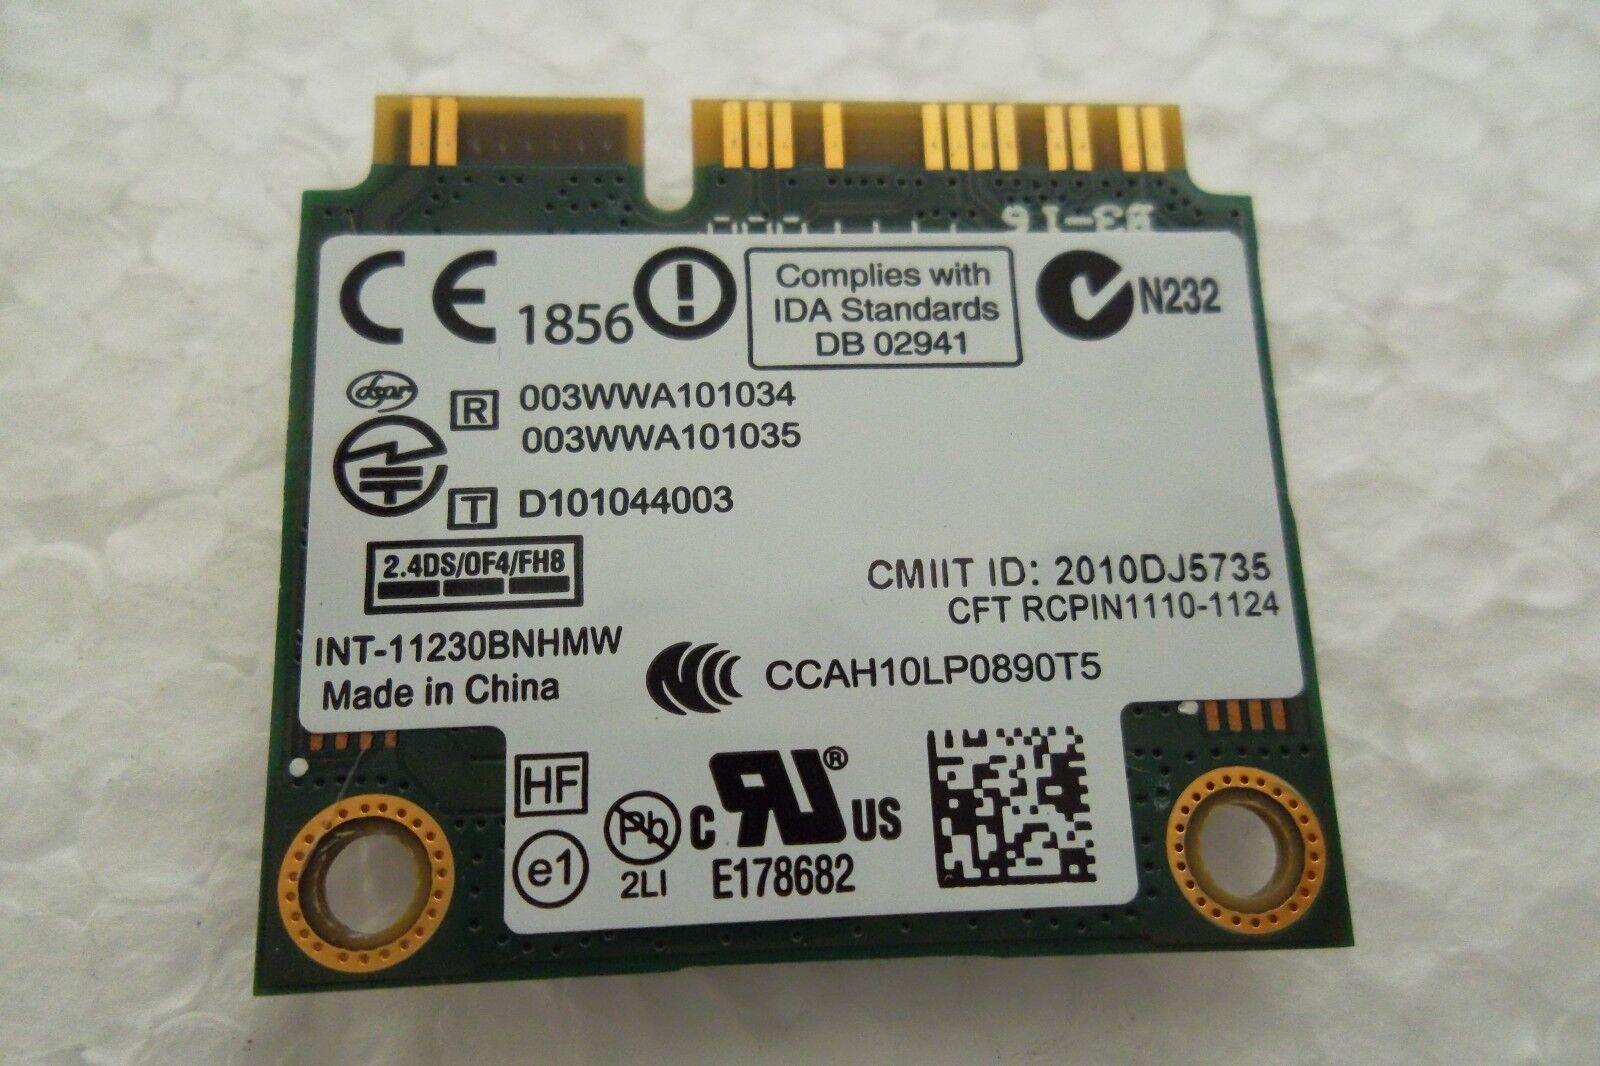 DELL INTEL 1030 WIRELESS N 11230BNHM 7KGX9 300MBPS WIFI BLUETOOTH MINI PCI-E CAR